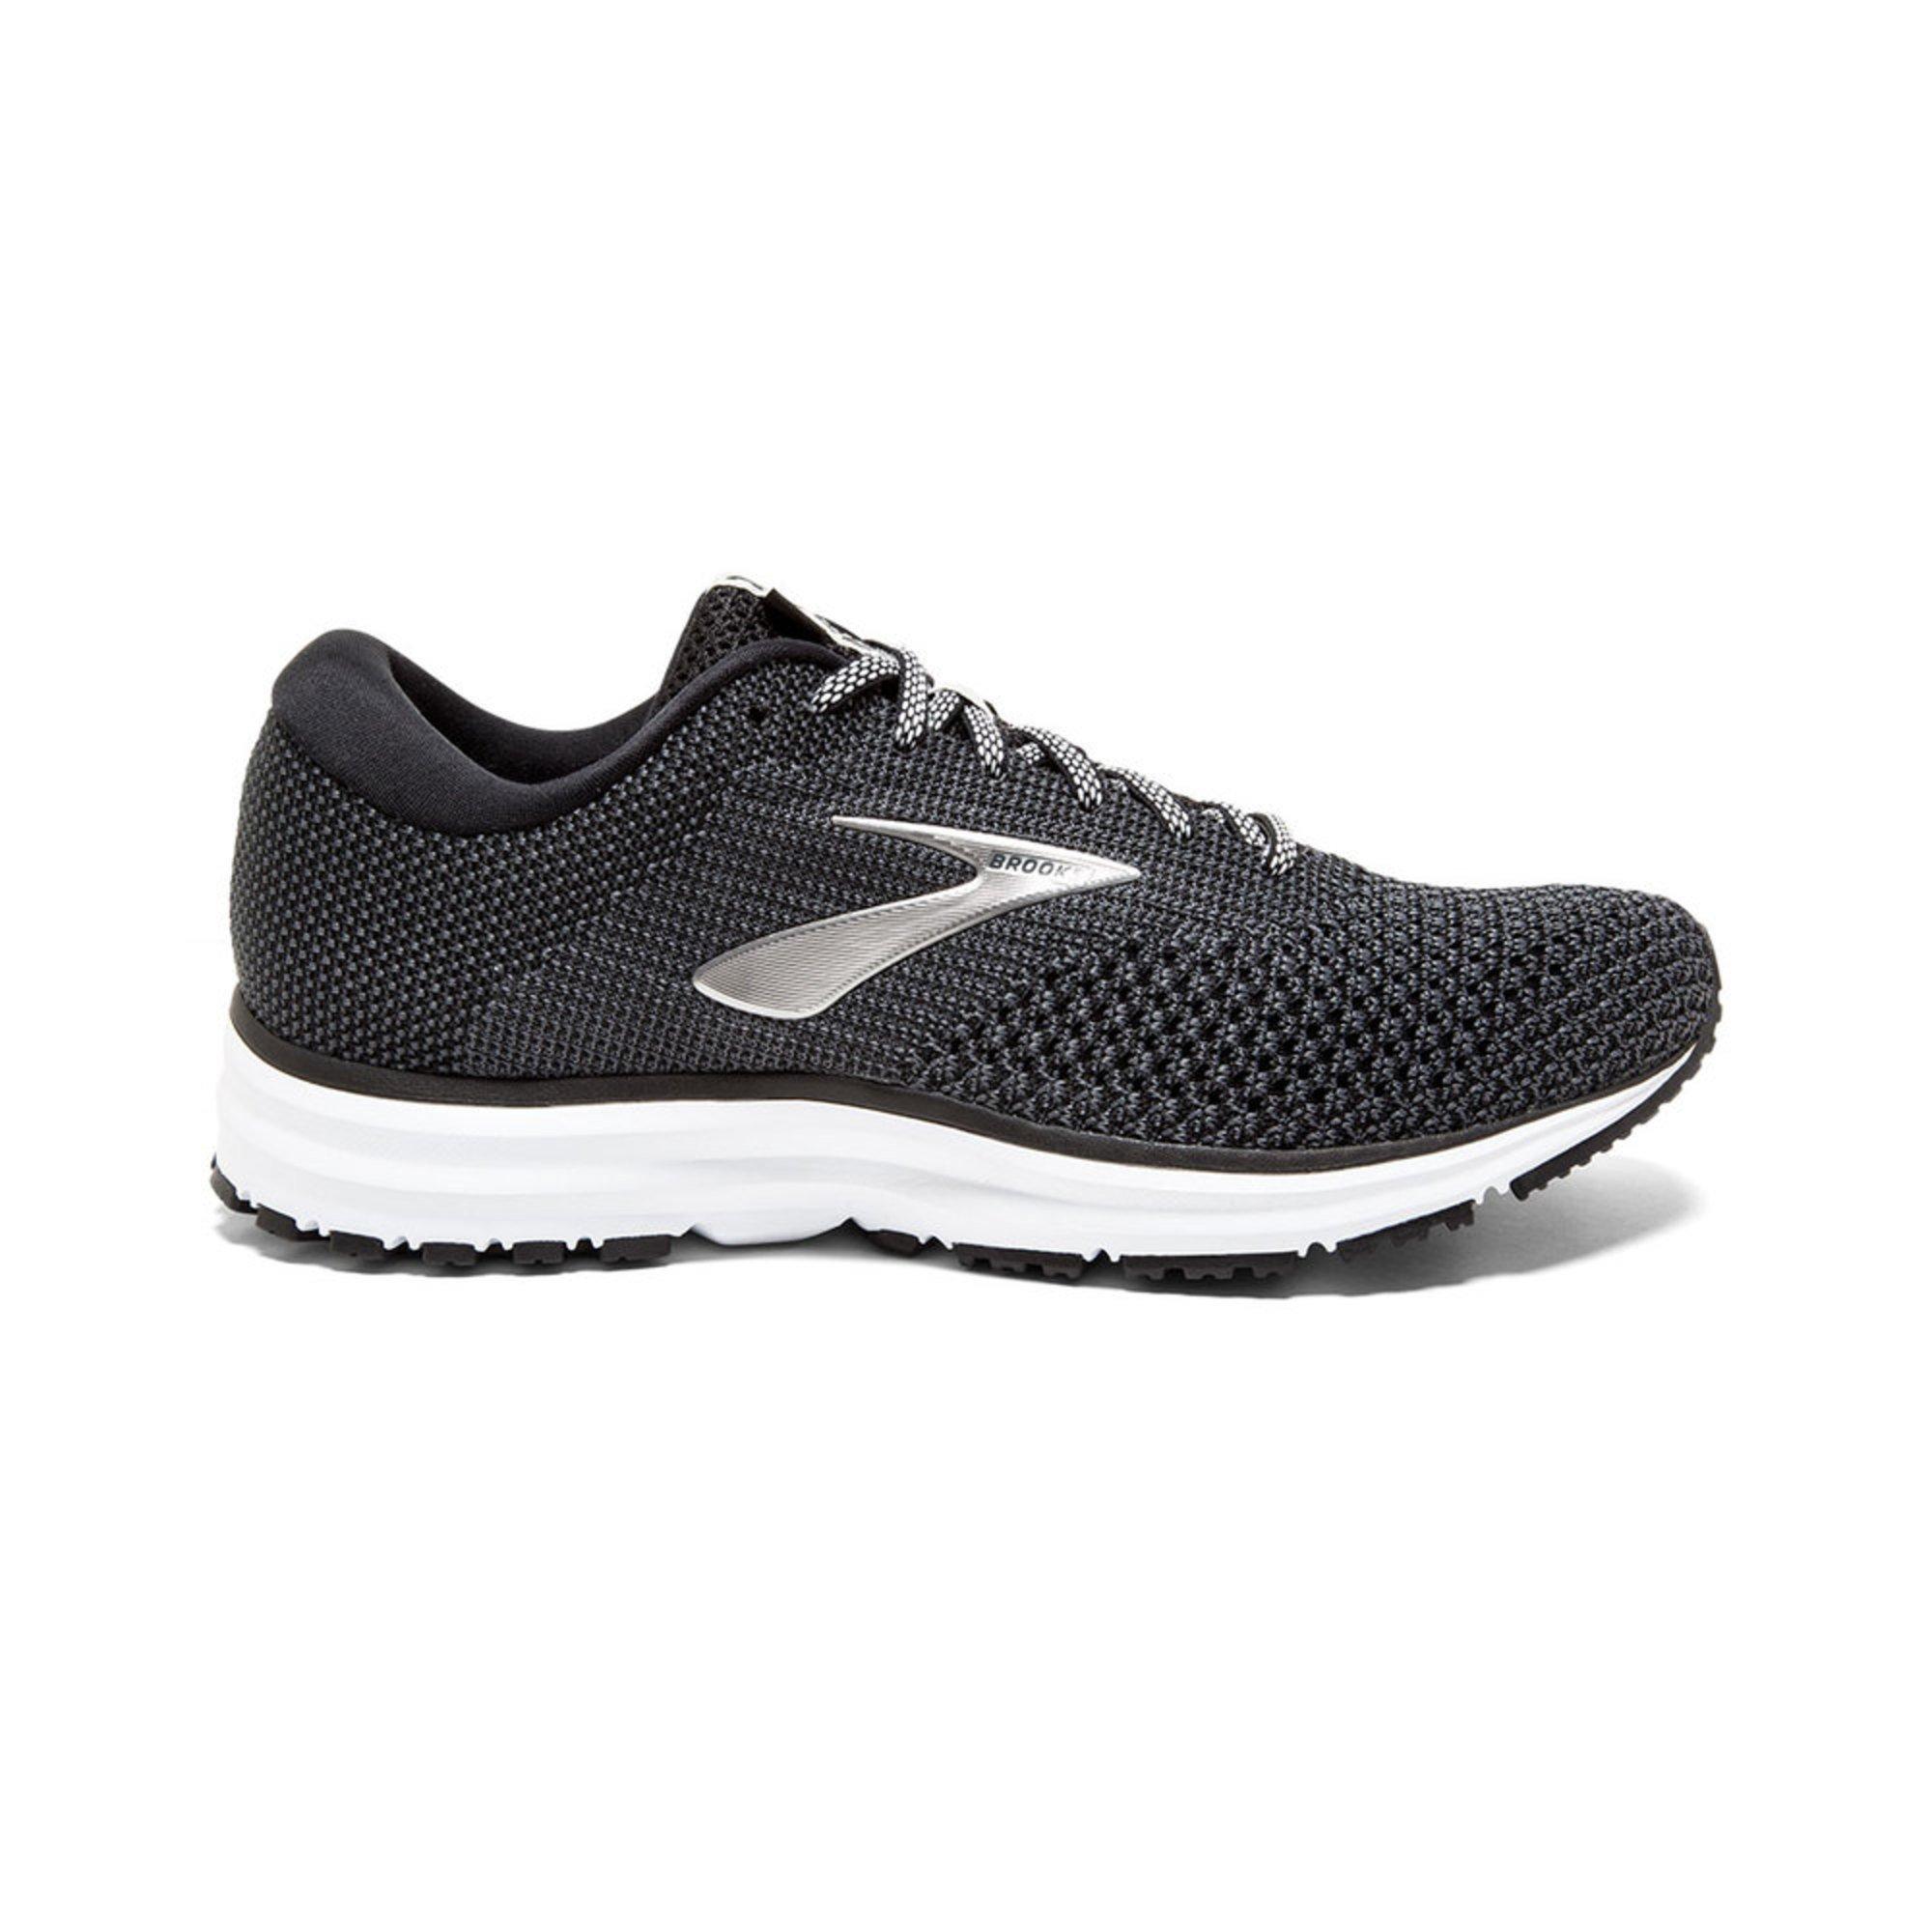 c22be2bdc7058 Brooks Women s Revel 2 Running Shoe